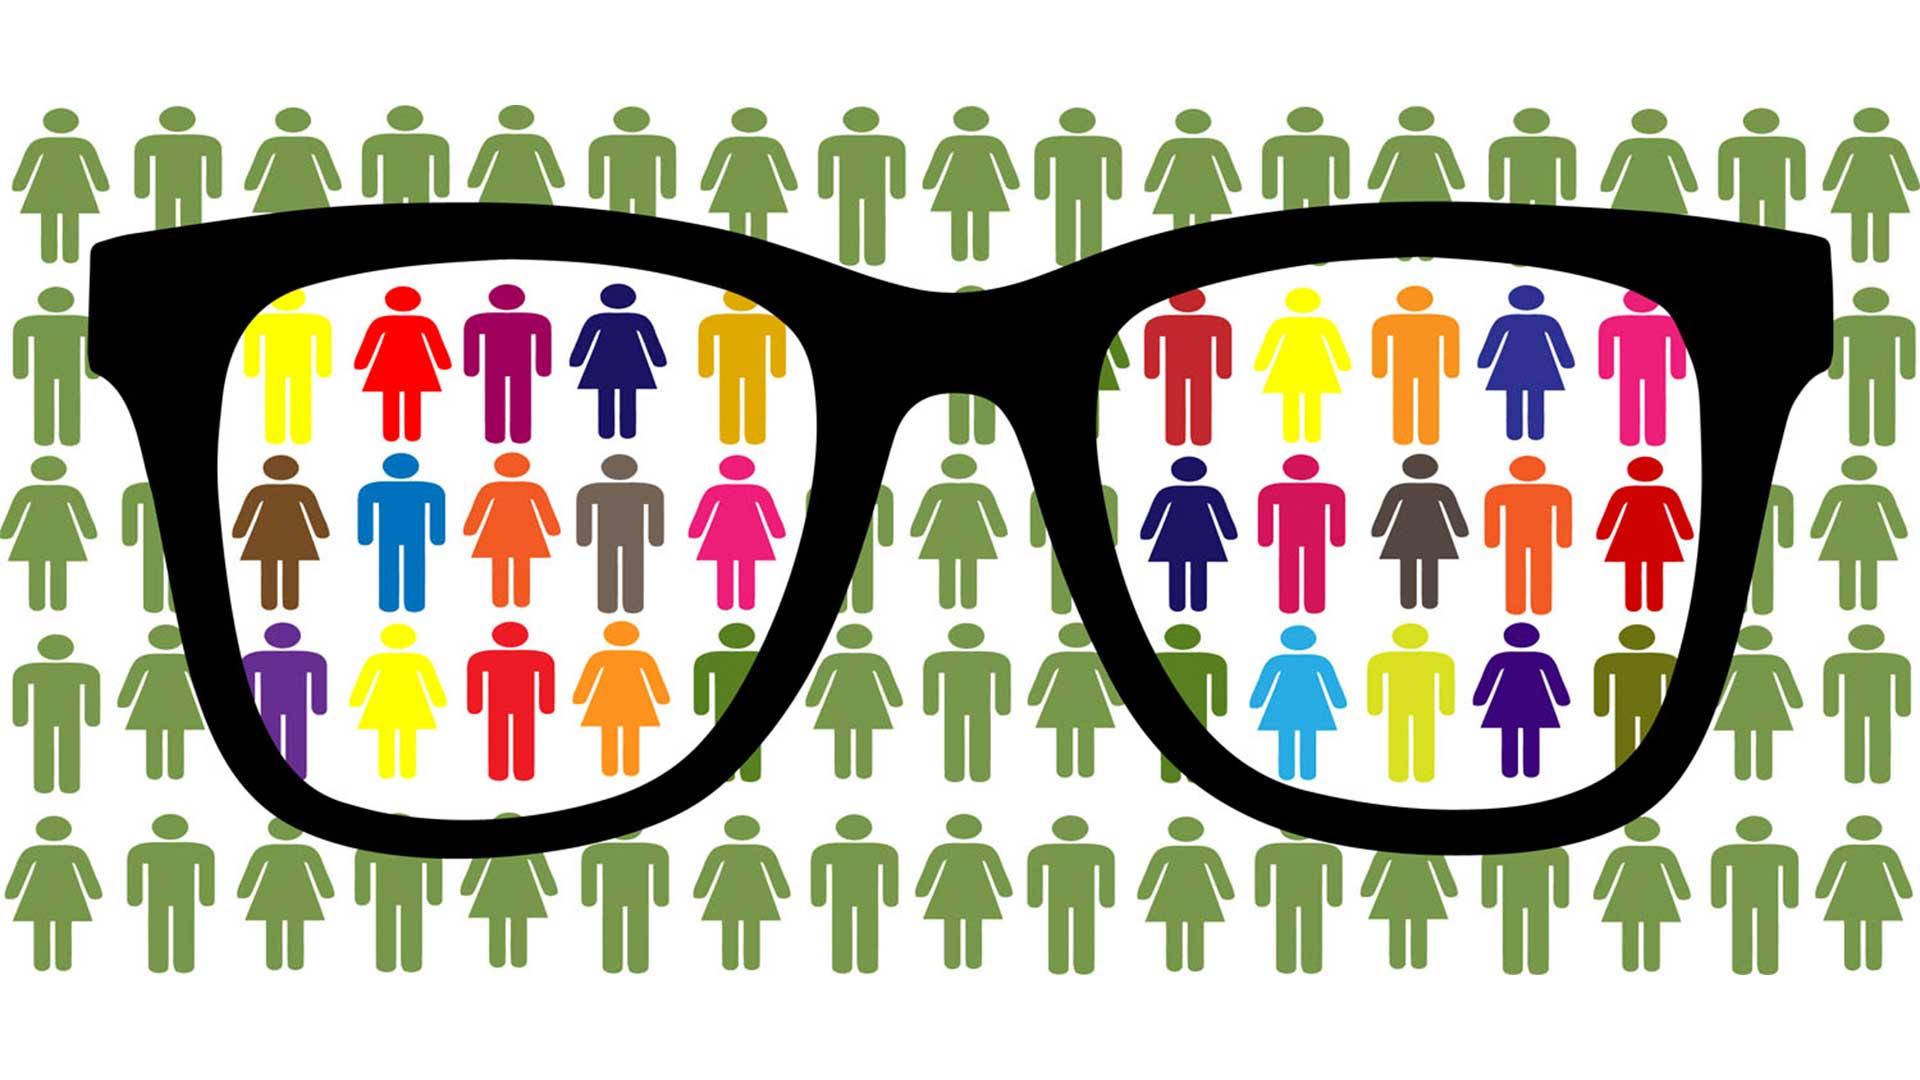 Igualtat taller de gènere